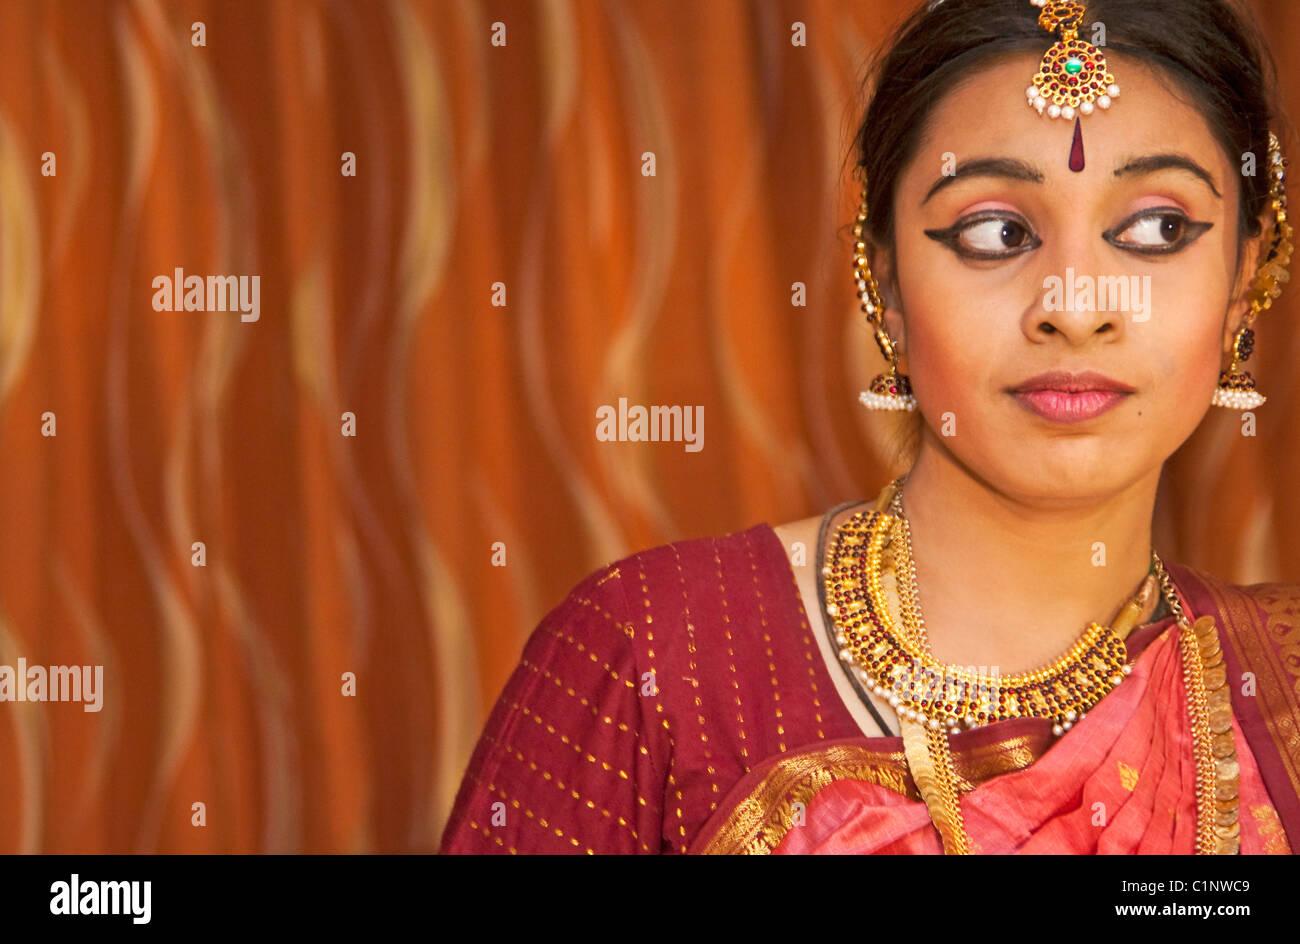 Bharata Natyam classical dancer of Tamil Nadu performed in Chennai - Stock Image